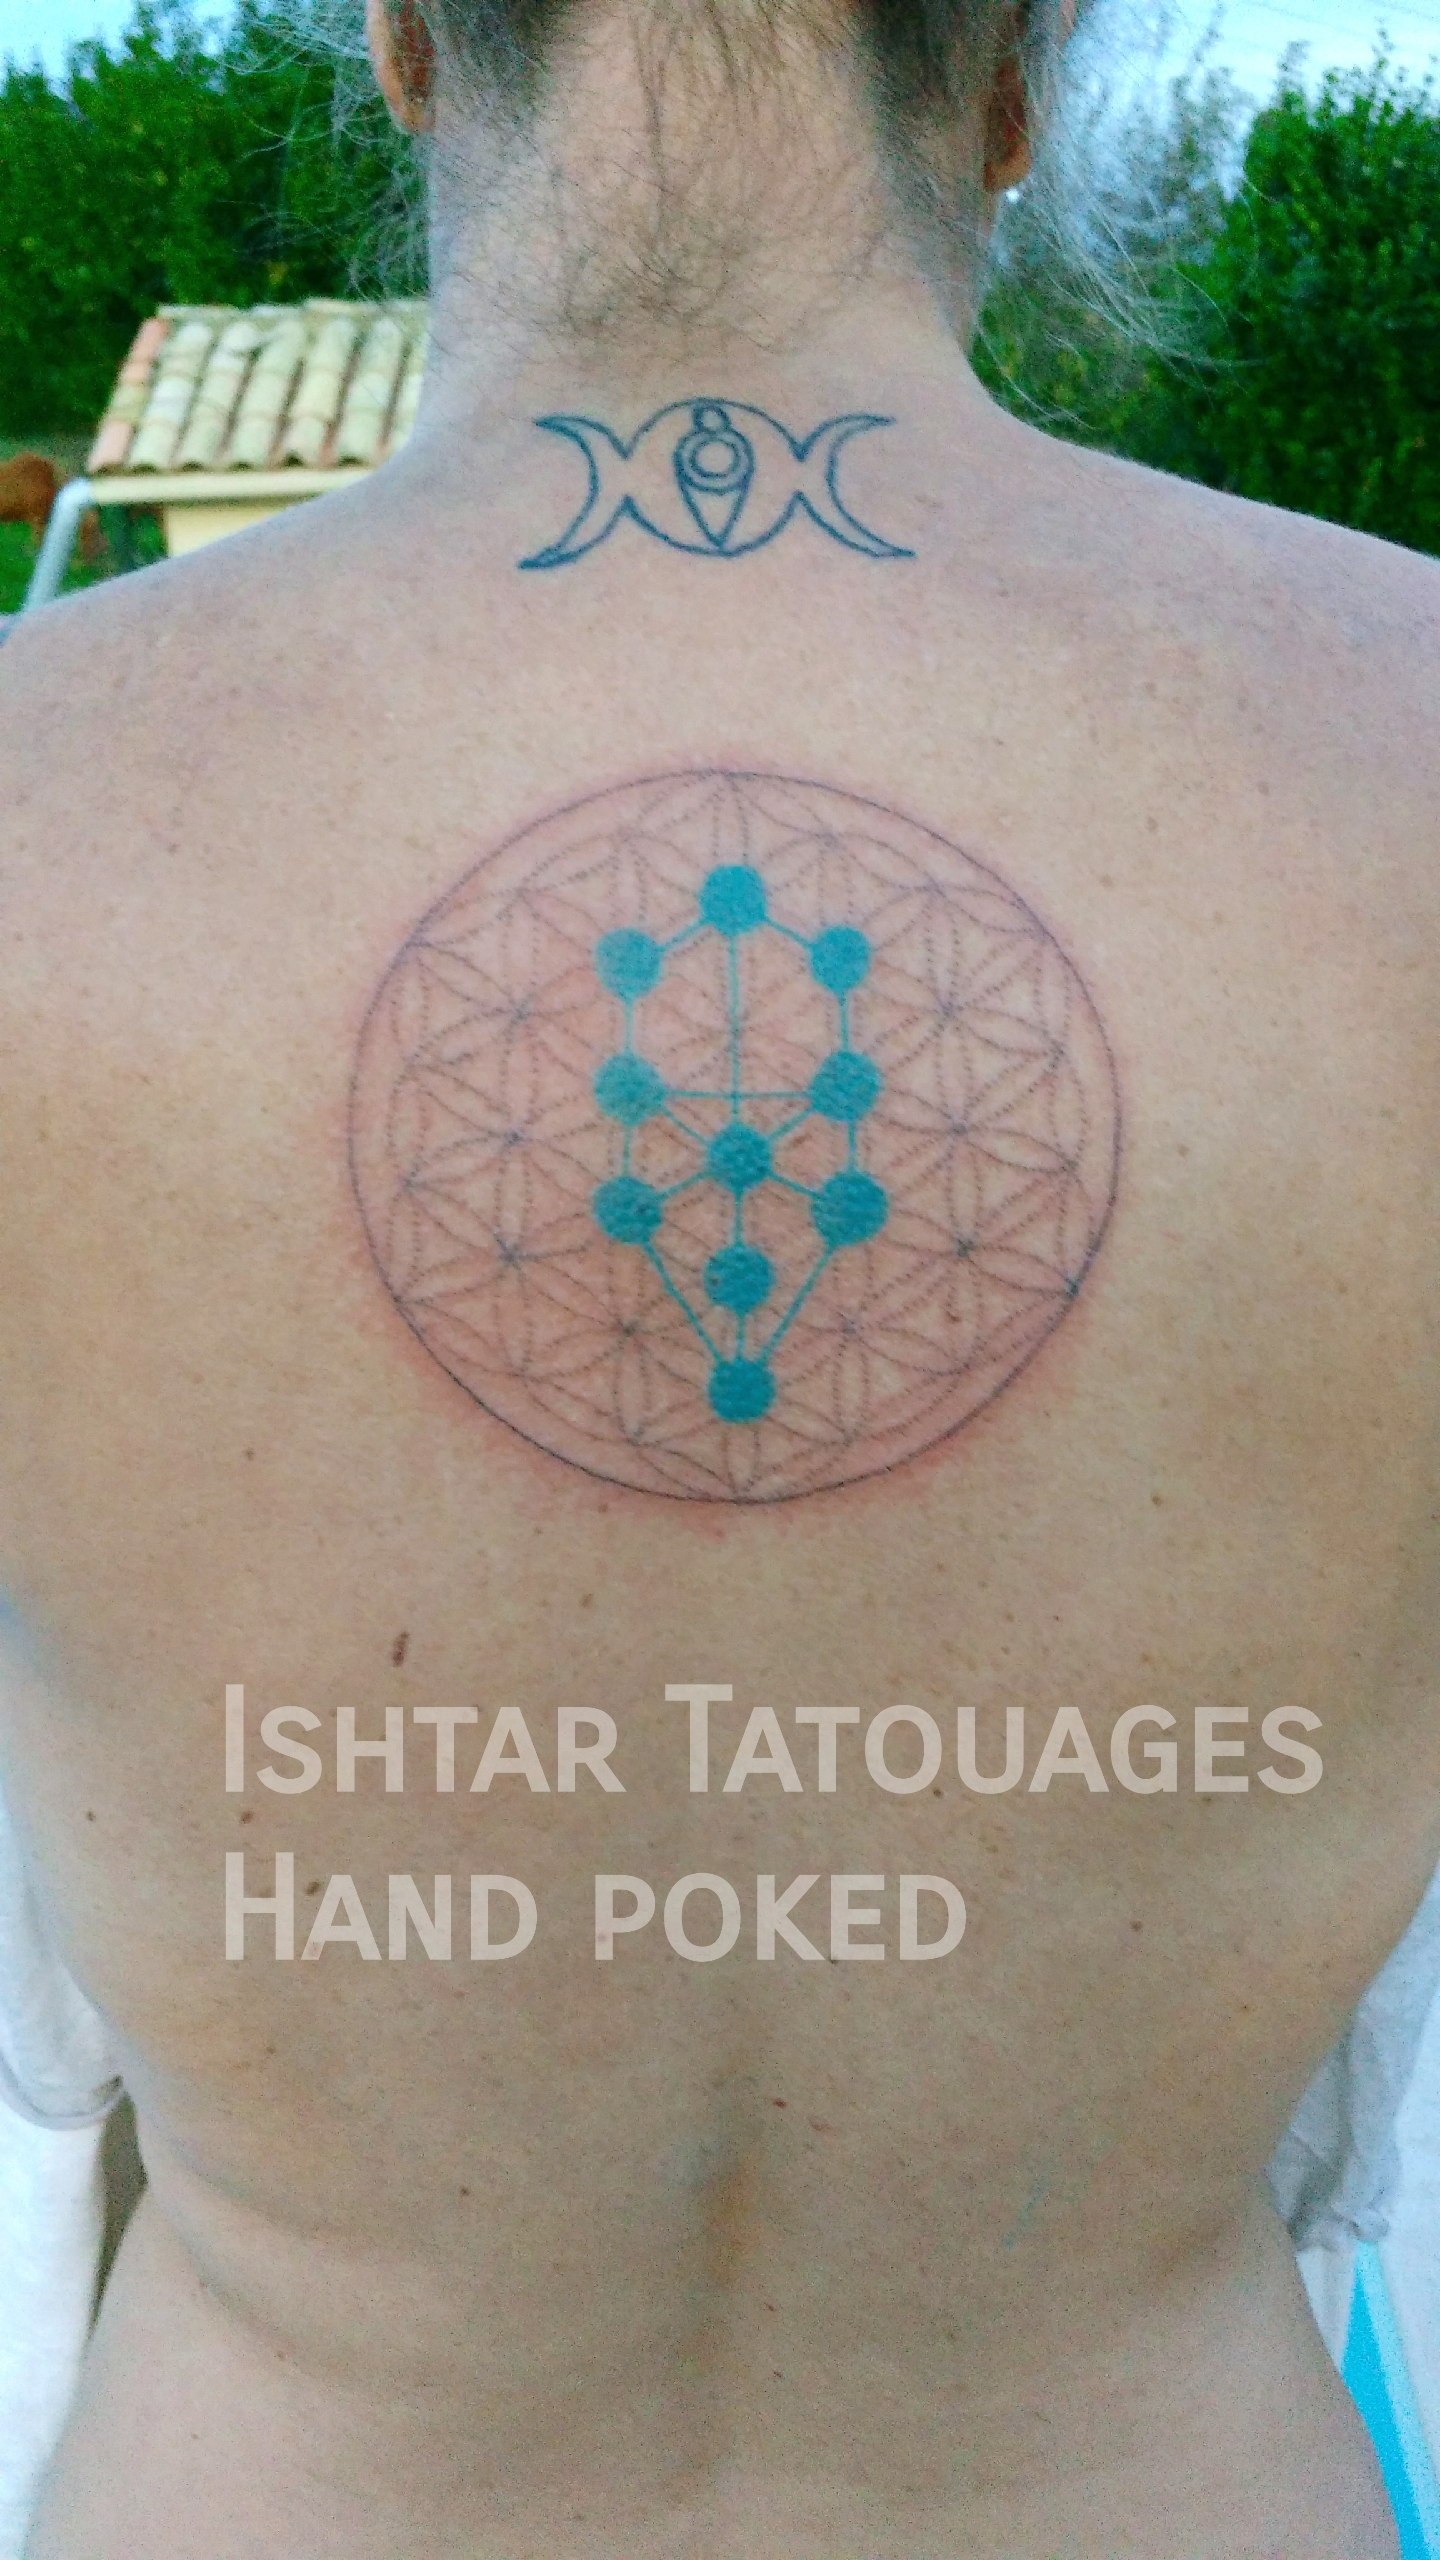 katia holist 39 ink tattoo tatouages handpoke. Black Bedroom Furniture Sets. Home Design Ideas